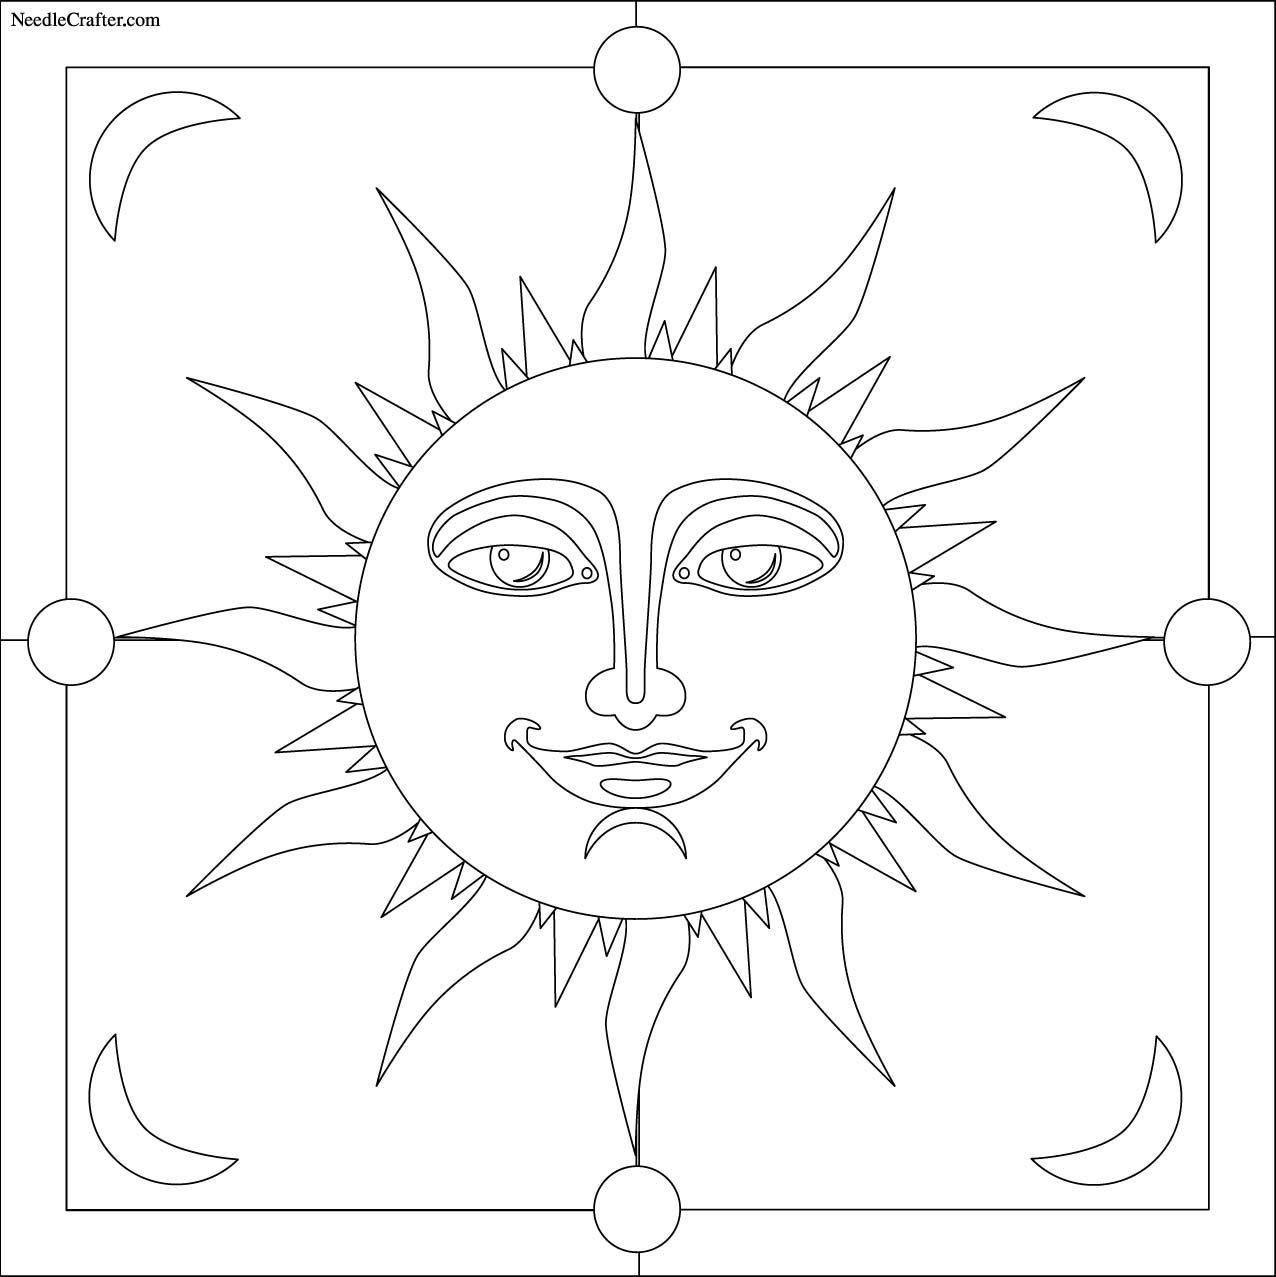 Free: Sun embroidery pattern